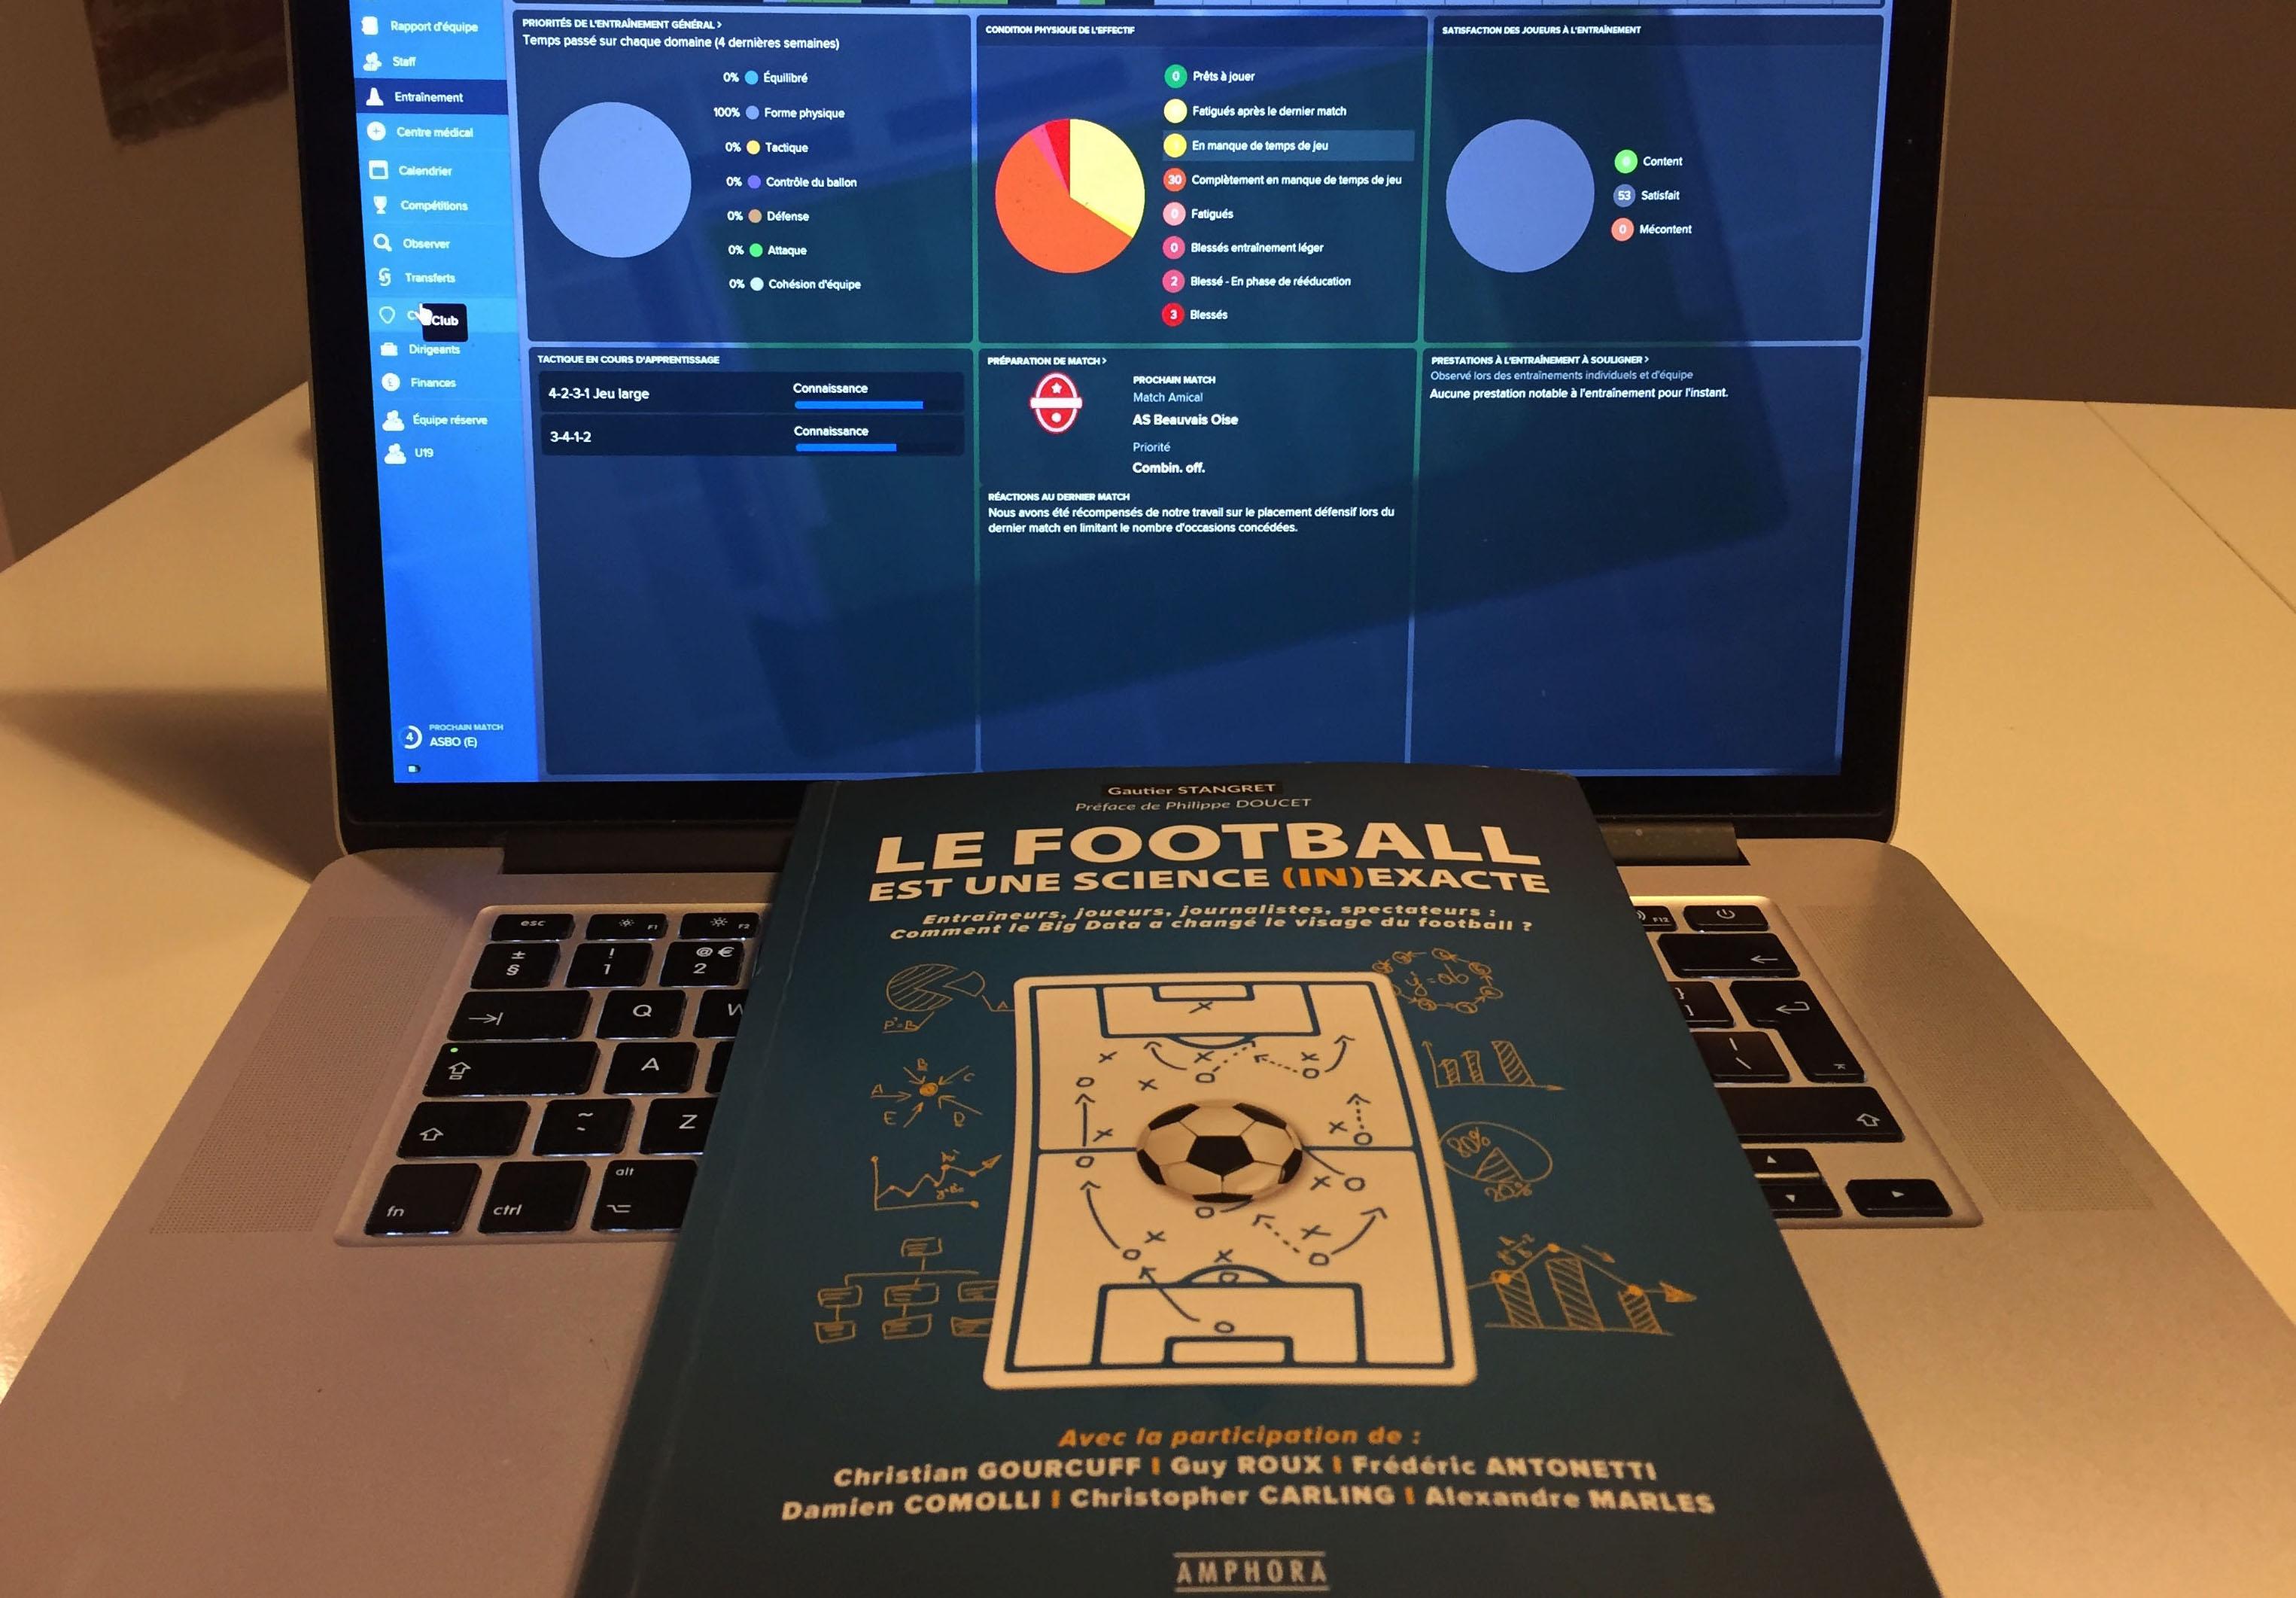 Le football est une science (in)exacte